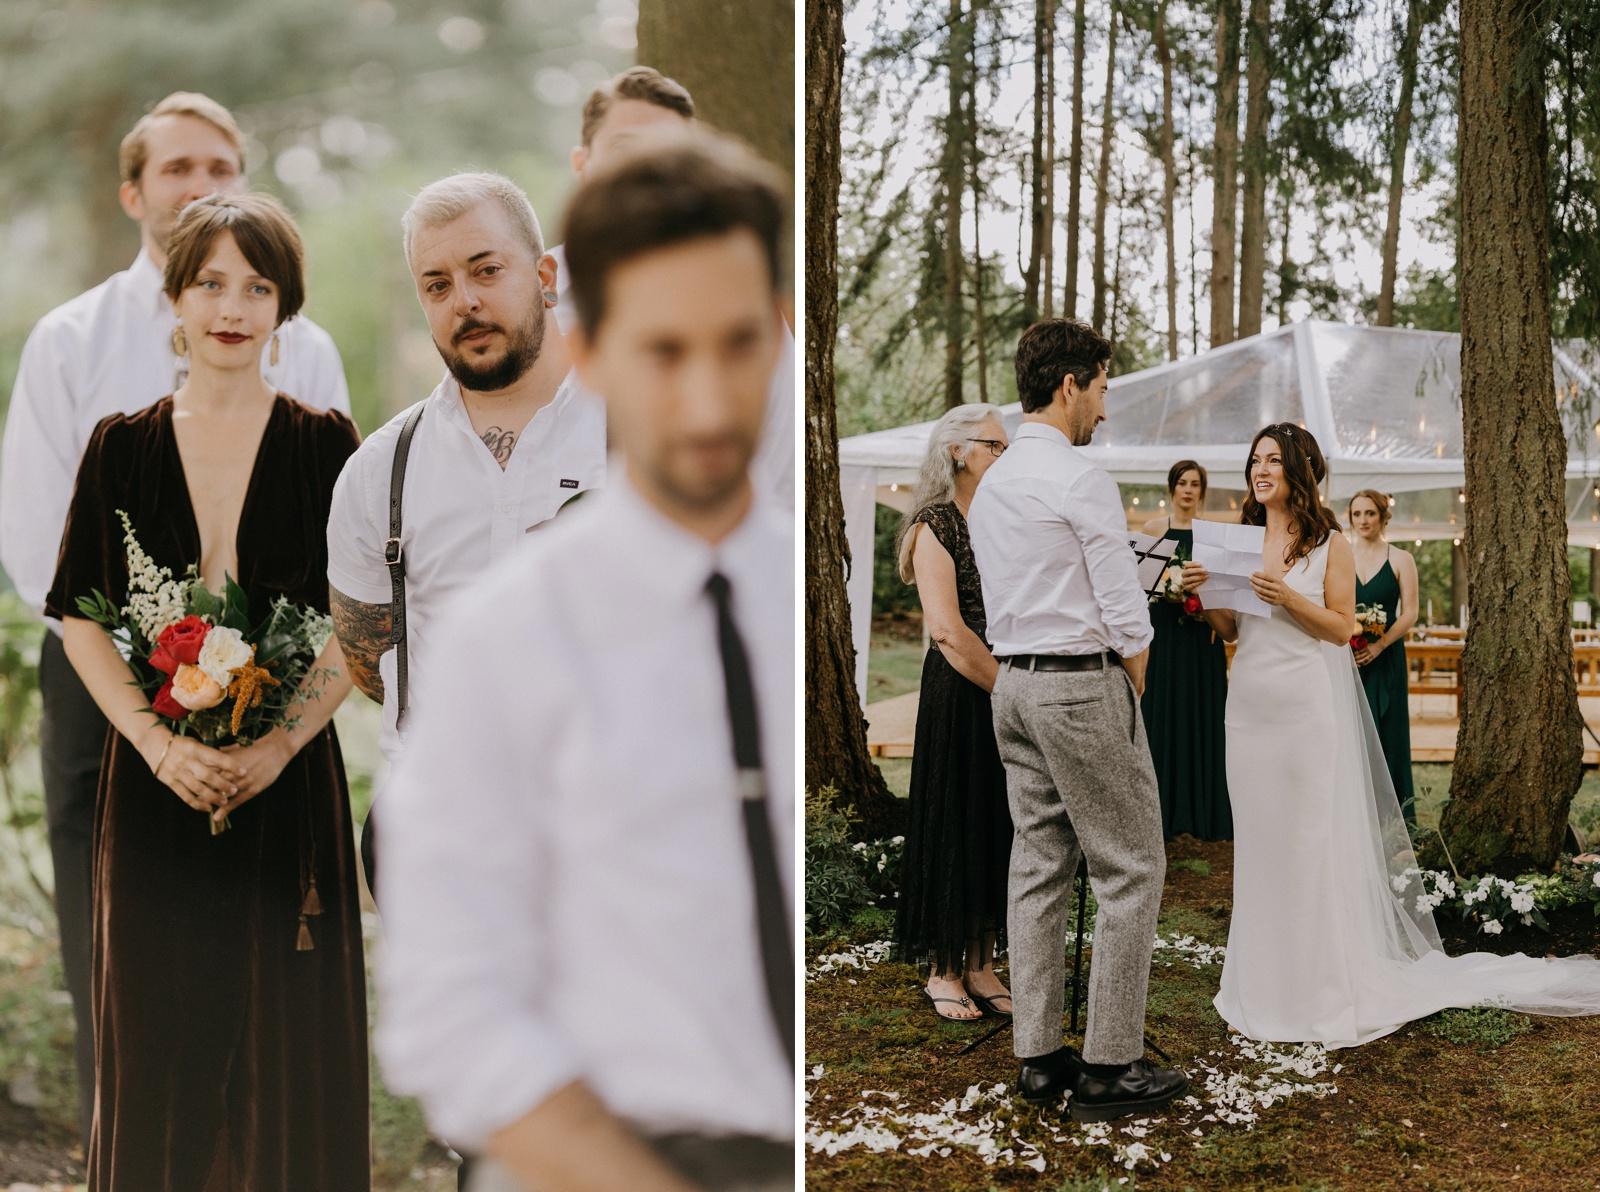 Matthew and Autumn Intimate Outdoor Backyard Wedding_0145